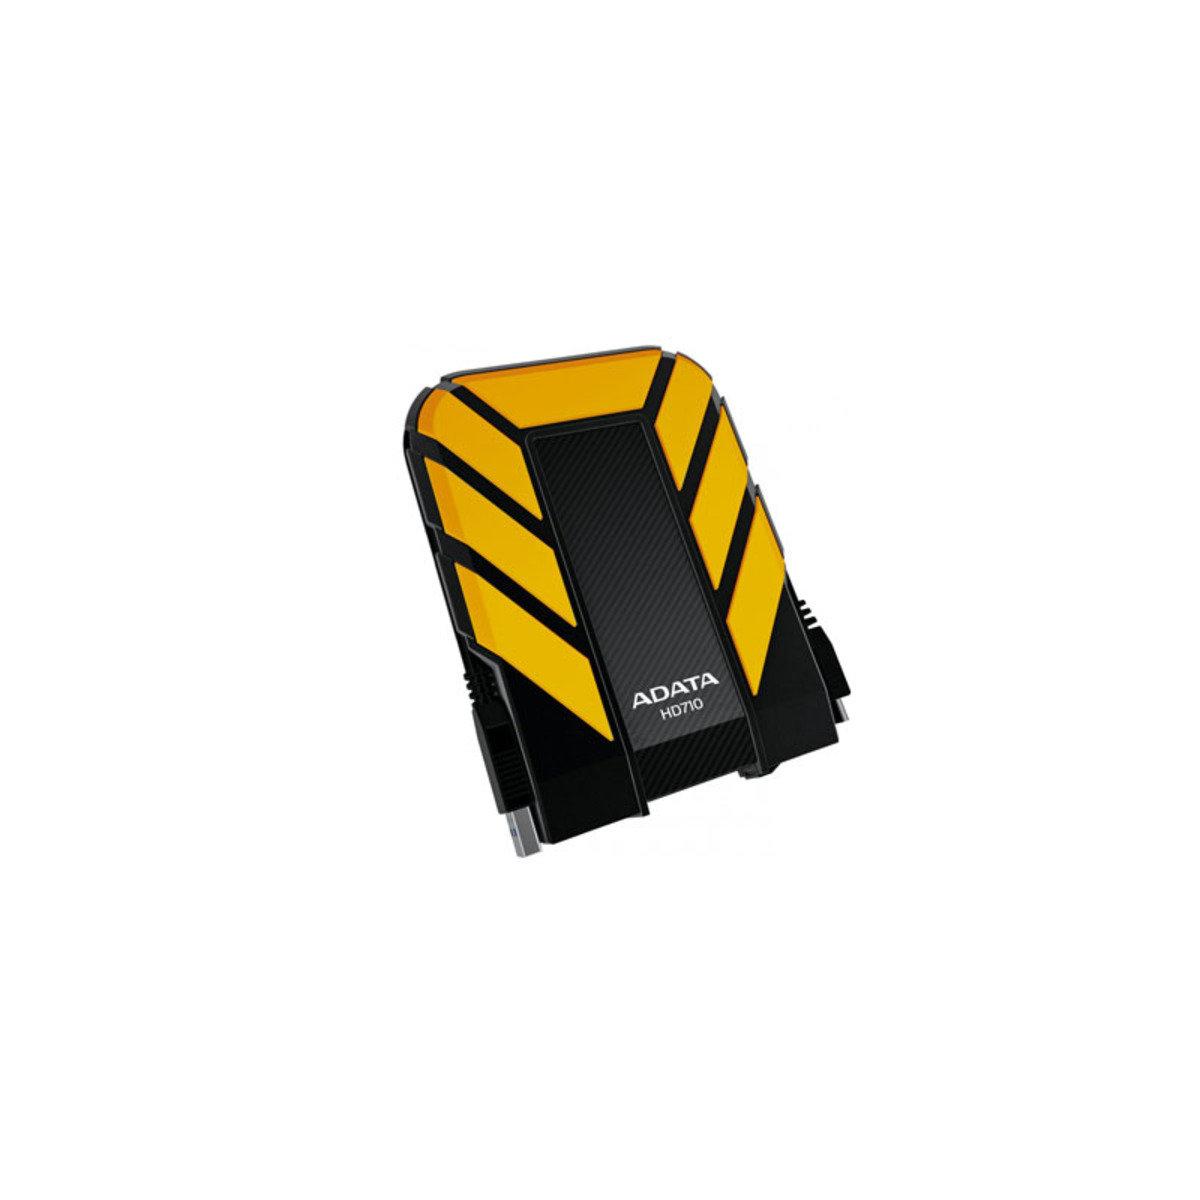 IP68 防水、防塵、抗震 USB 3.0 外置硬碟 HD710 1TB 黃色